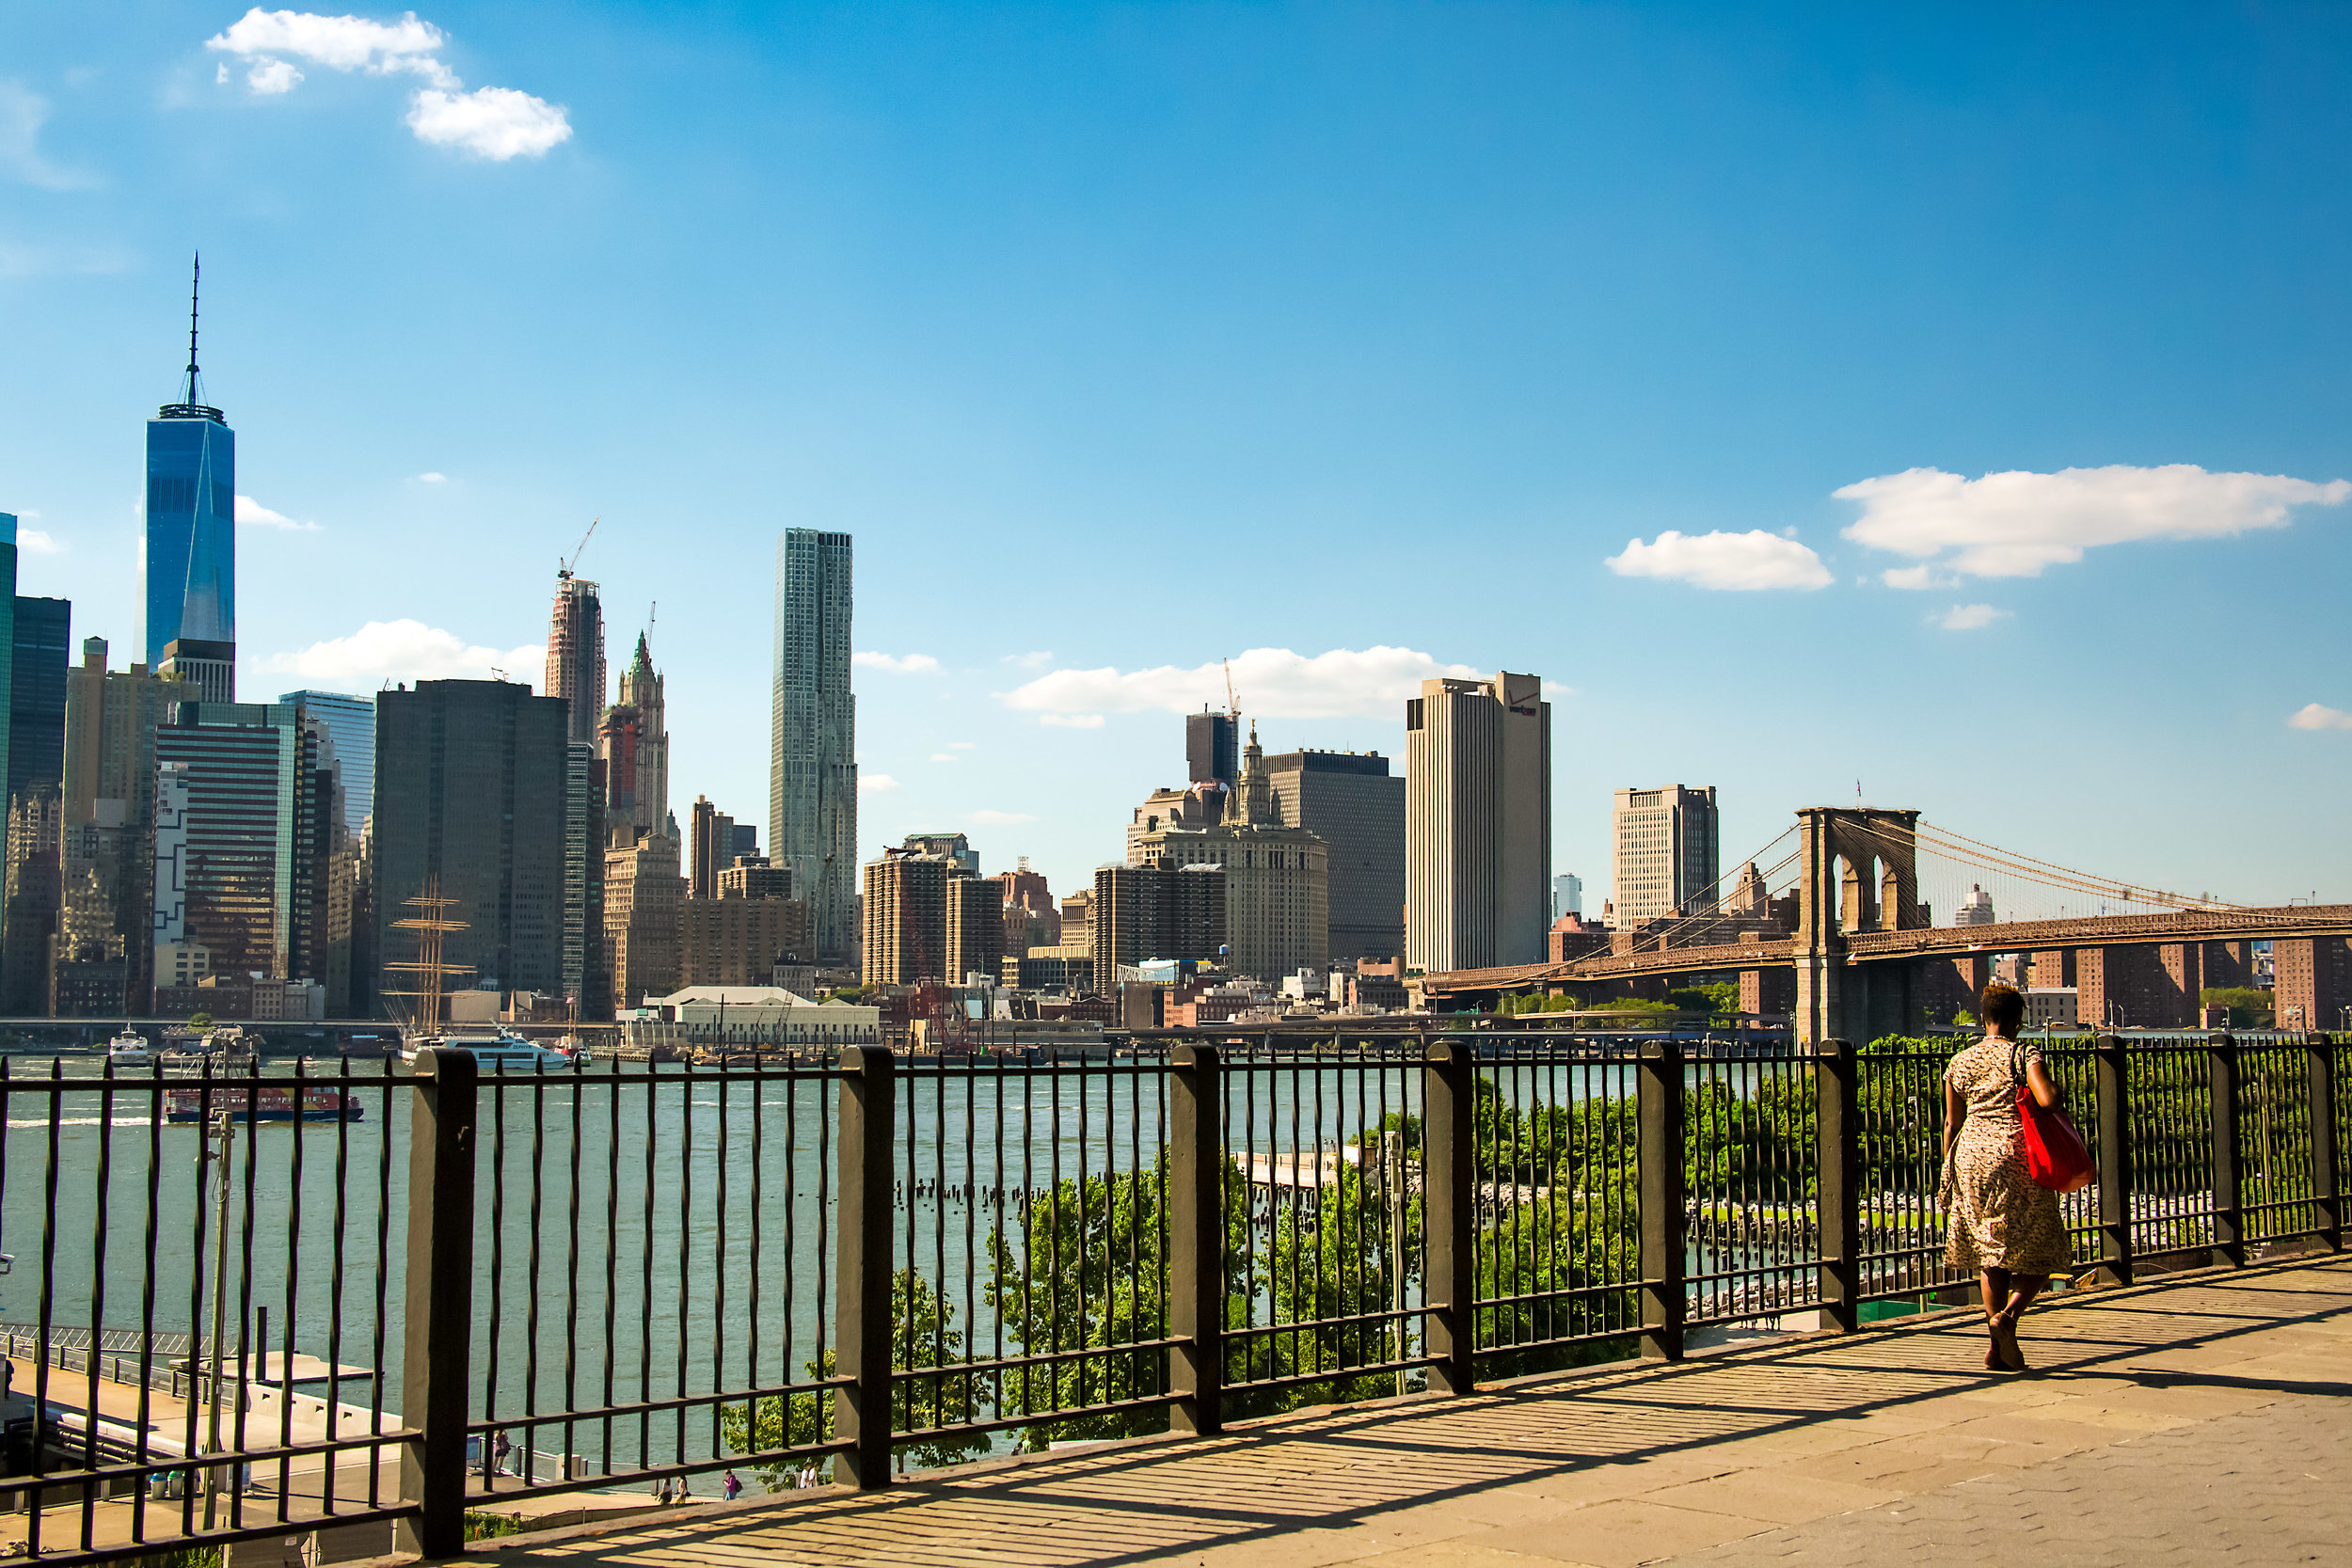 LSNY_Brooklyn_Bridge_Park-6.jpg